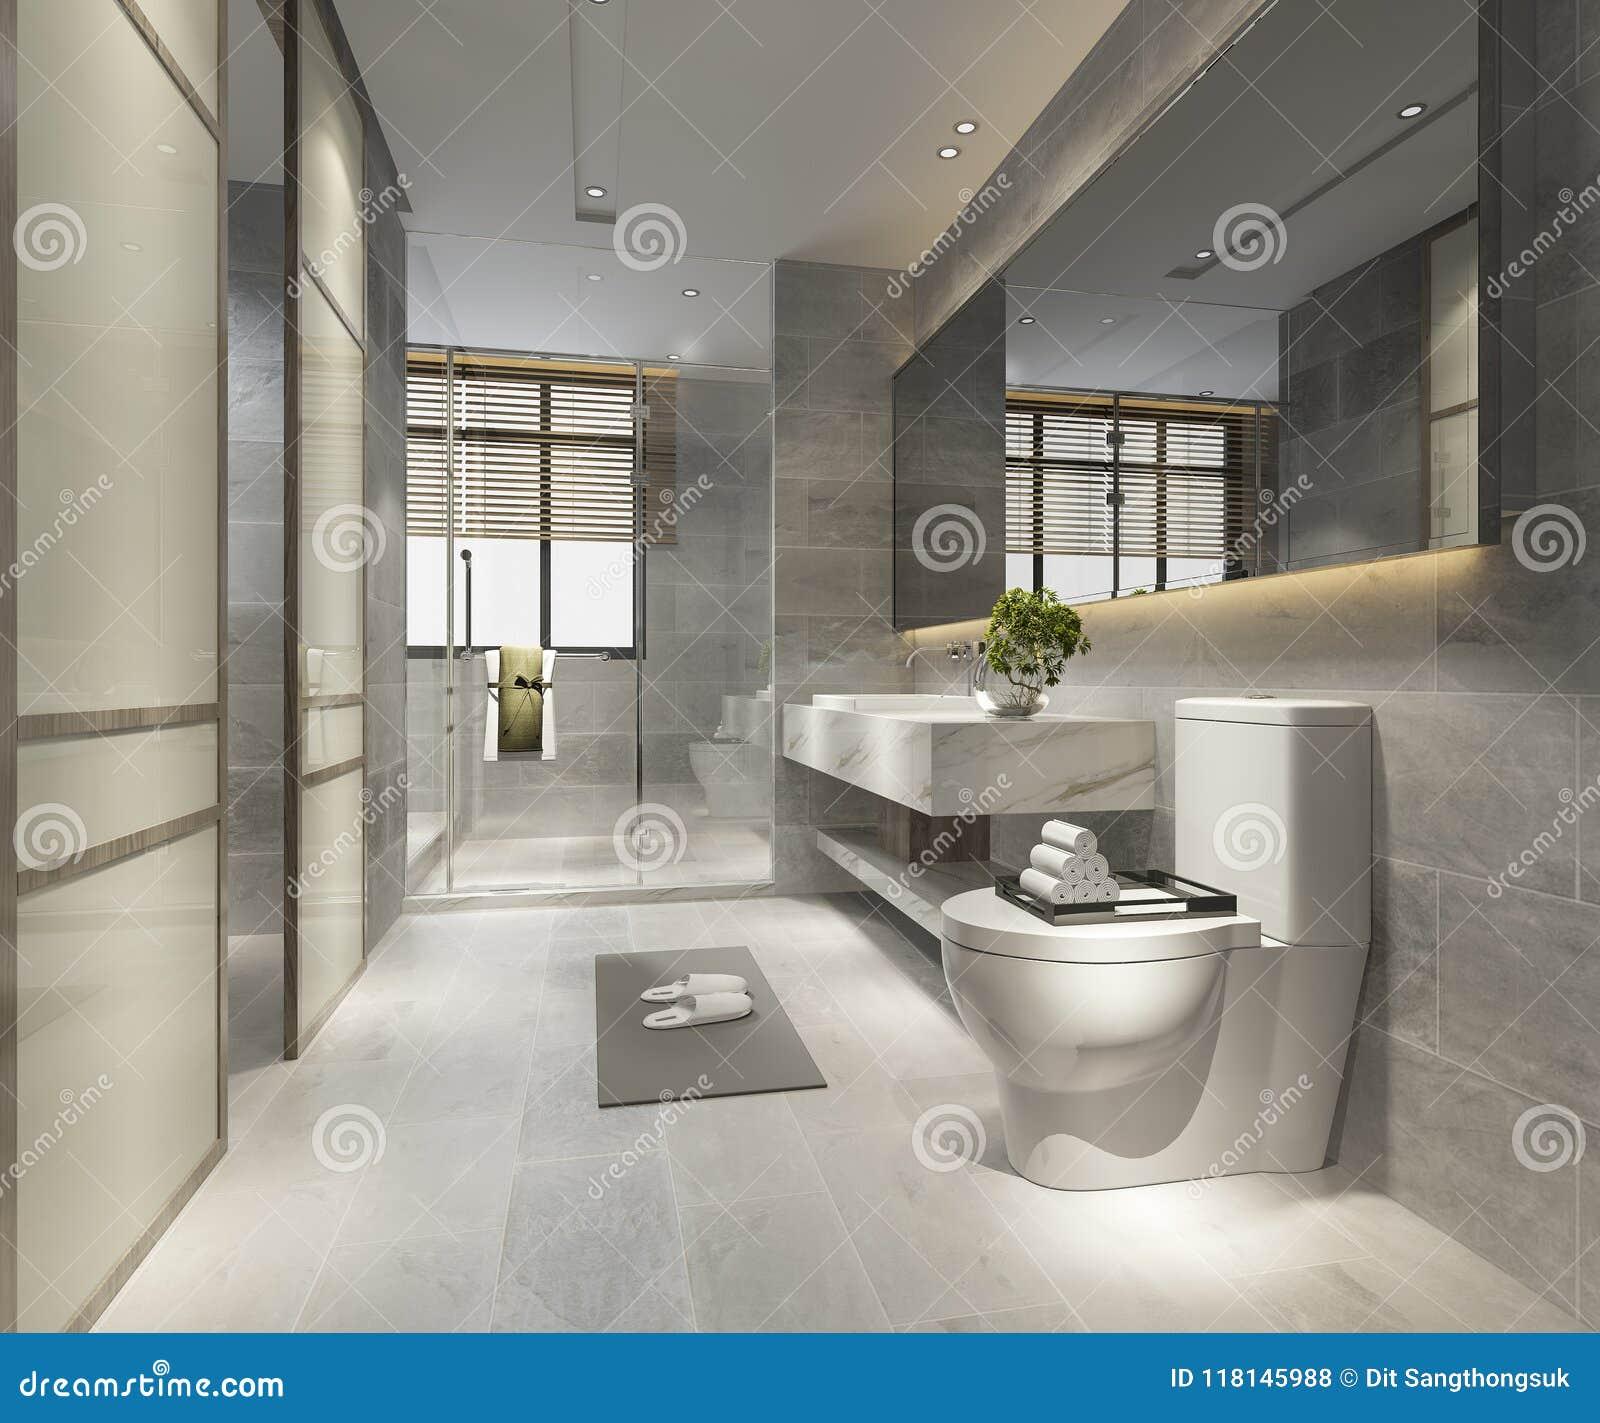 luxuryous modern bathroom design naturally image   3d Rendering Luxury Modern Design Bathroom And Toilet ...